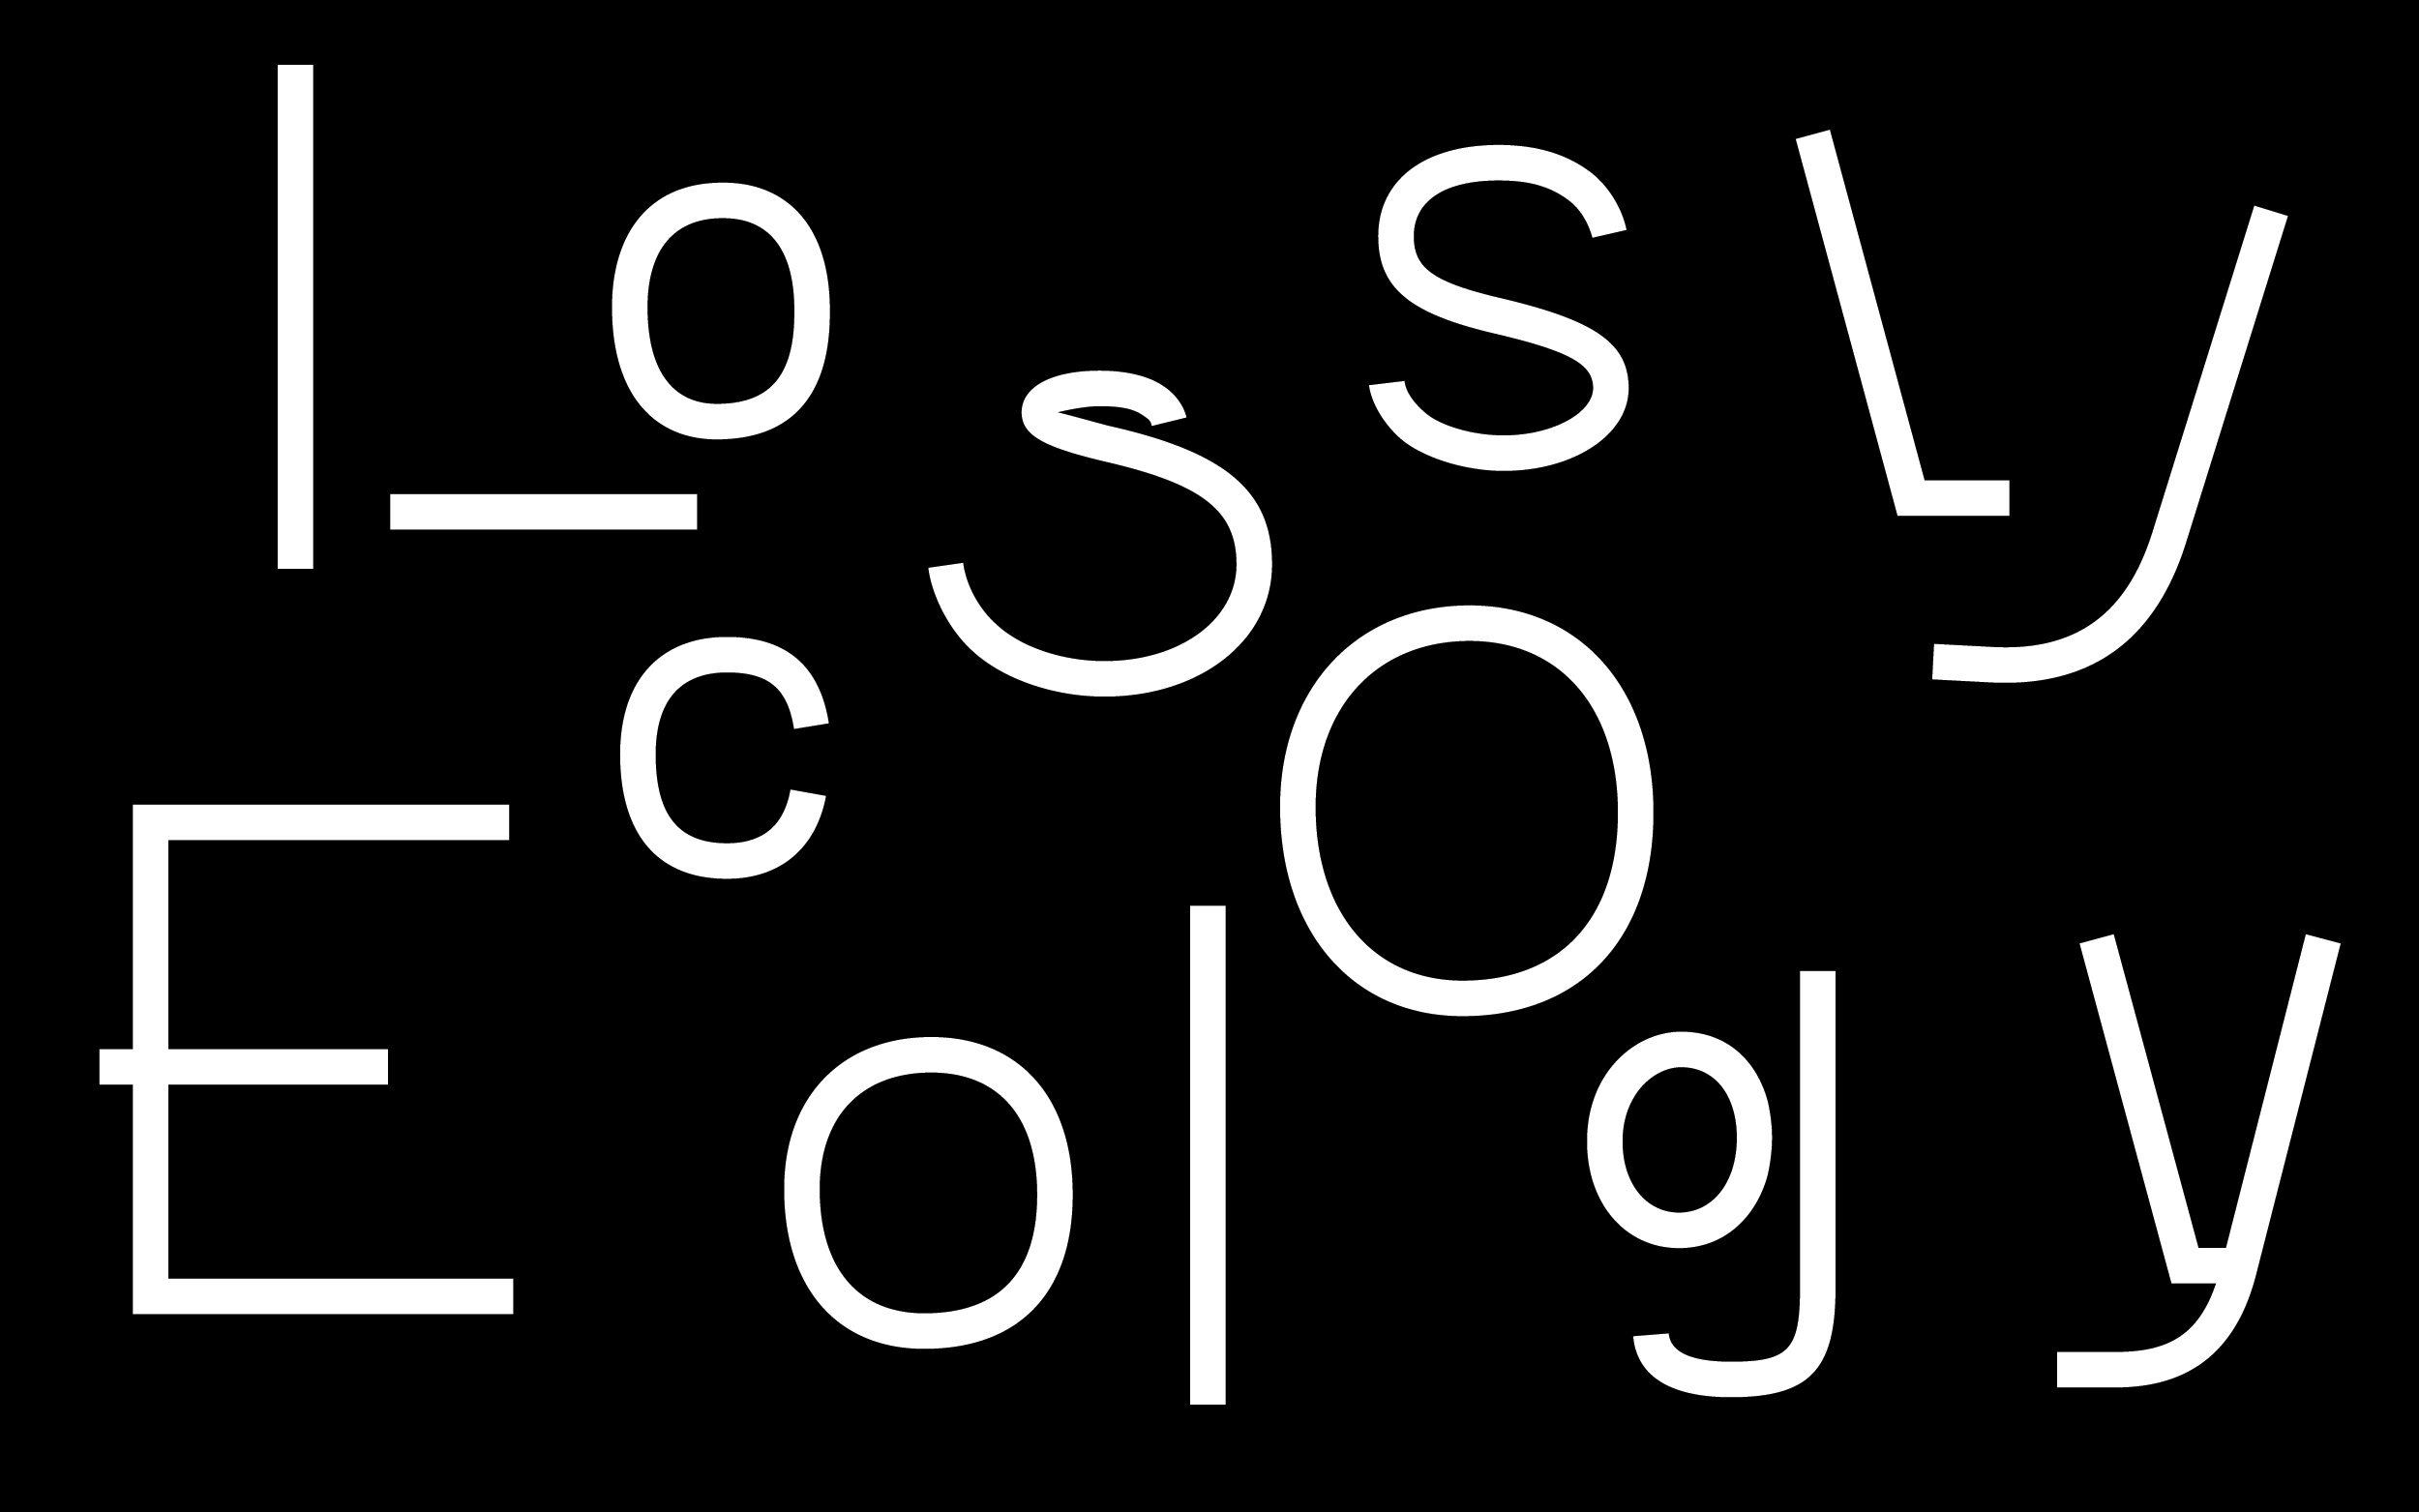 LOSSYECOLOGY1.jpg